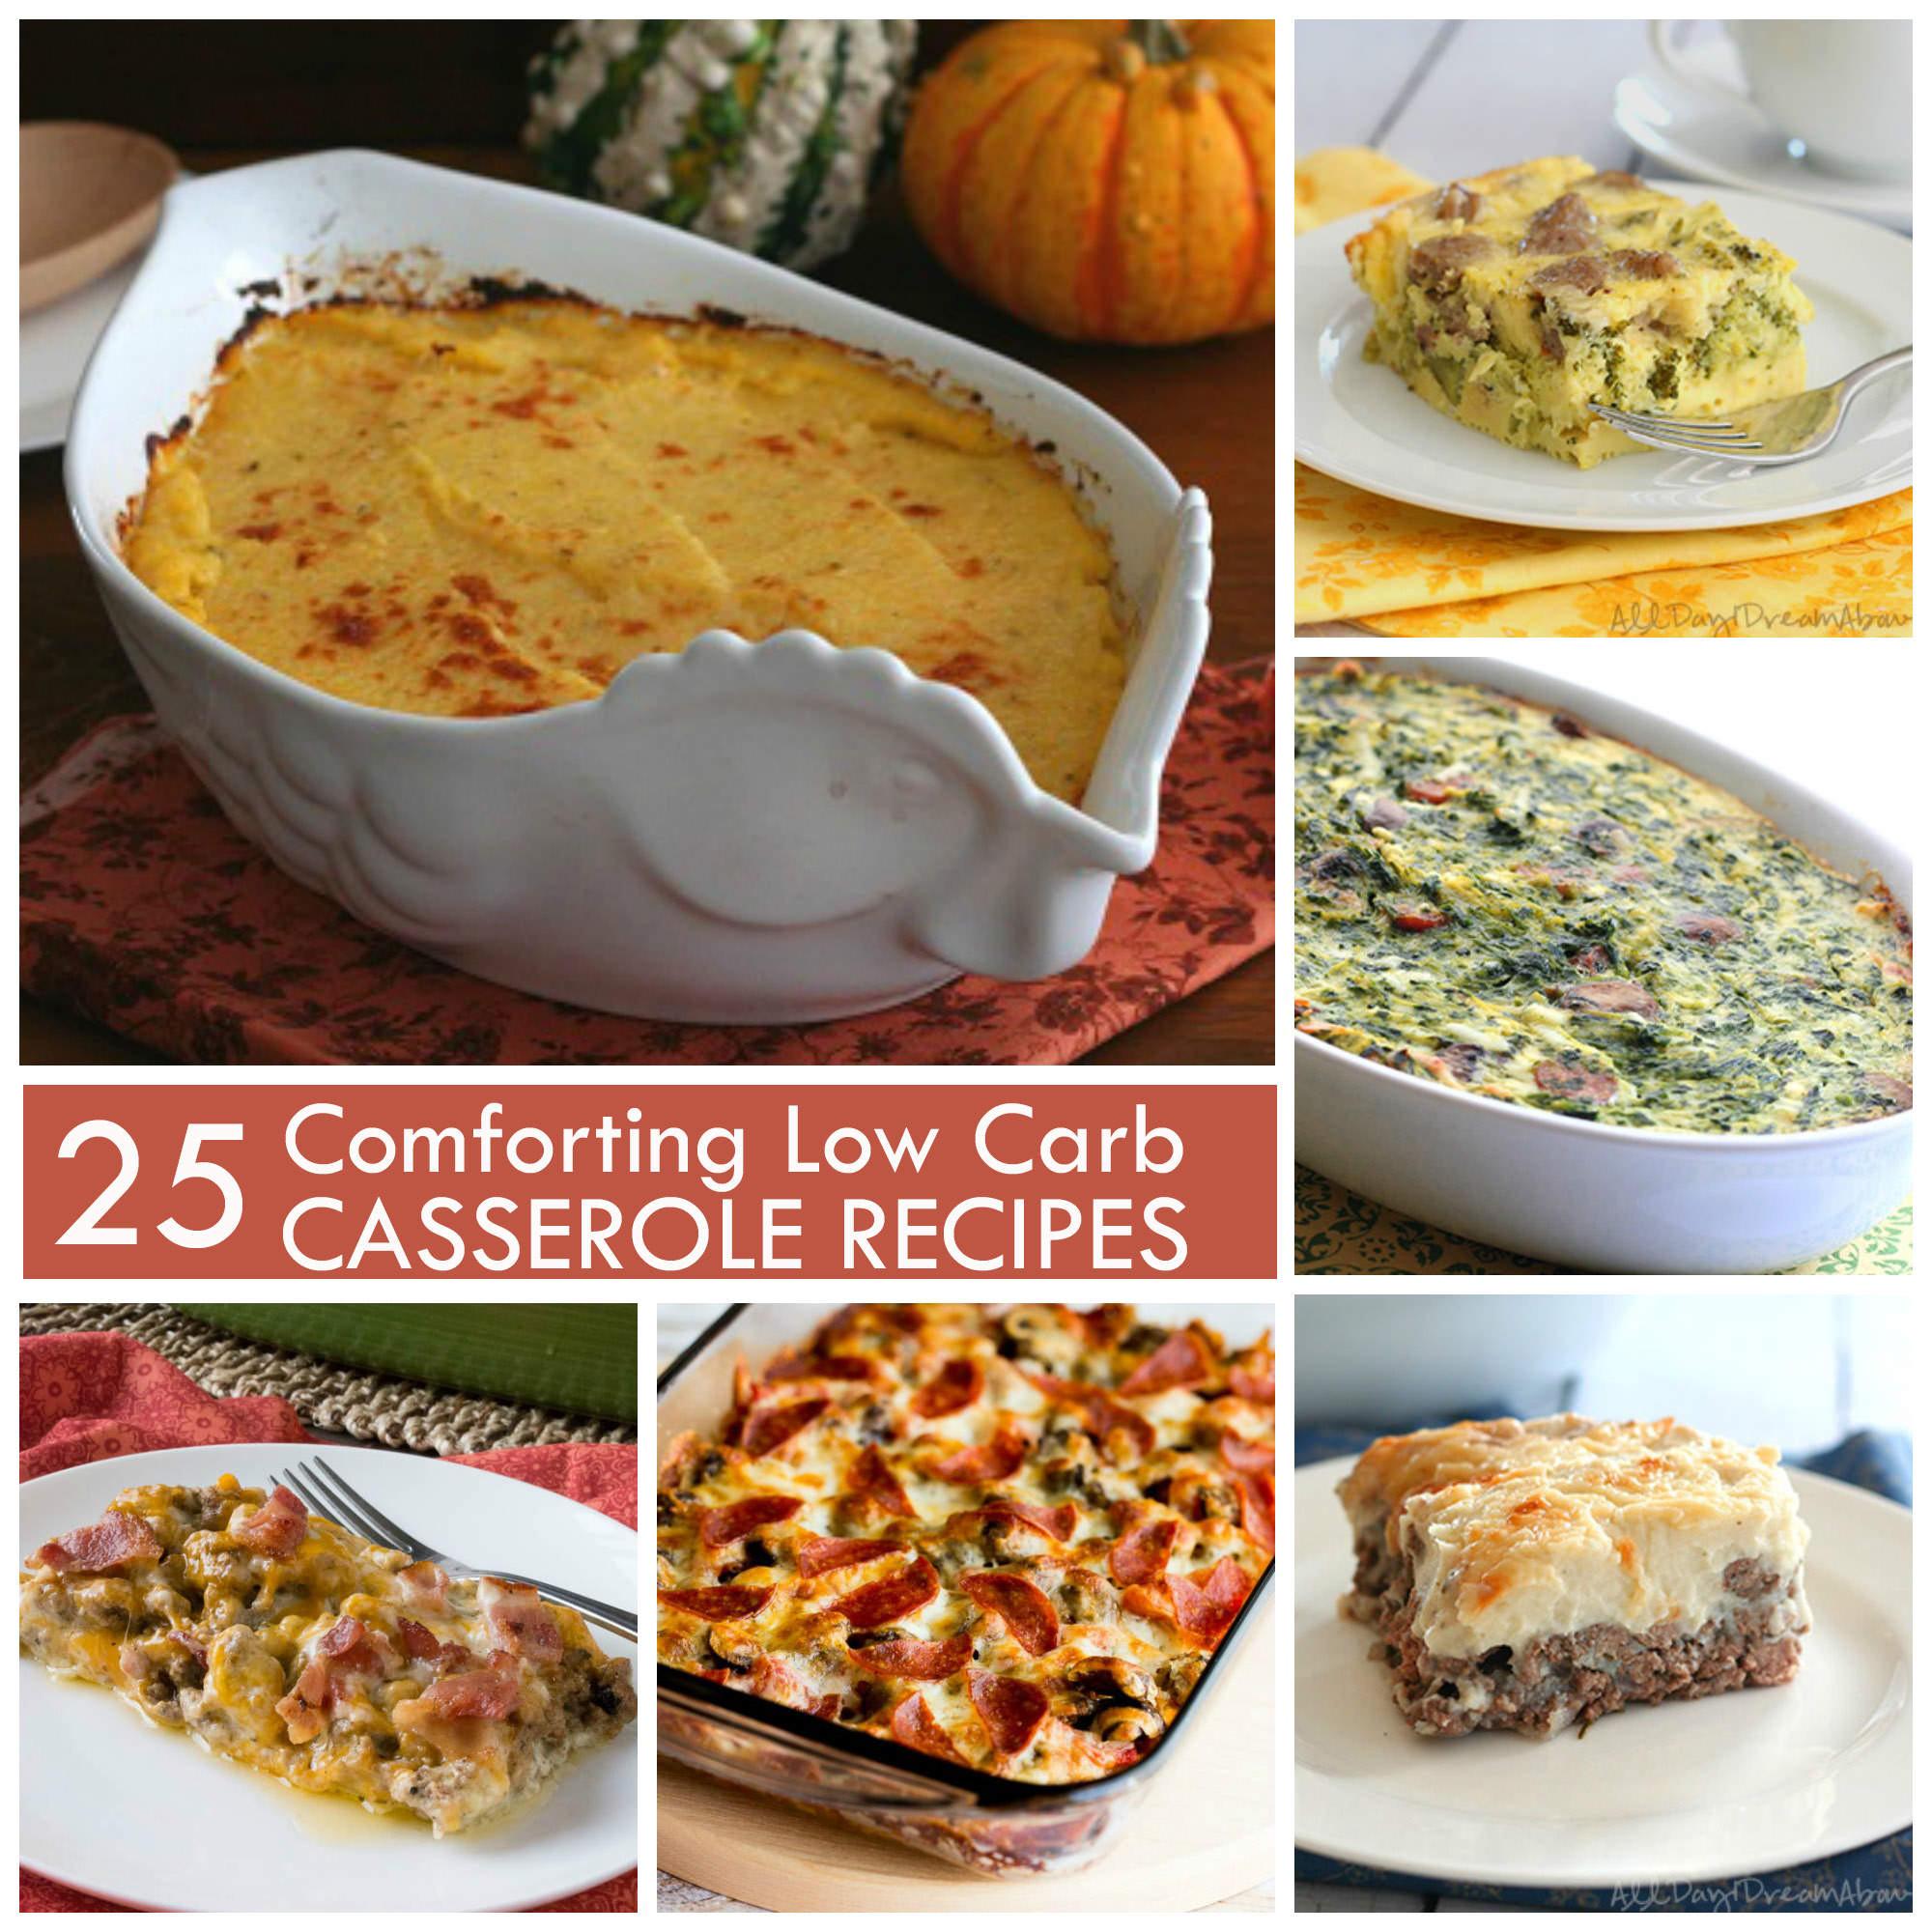 Low Carb Casserole Recipes  25 Low Carb Casserole Recipes